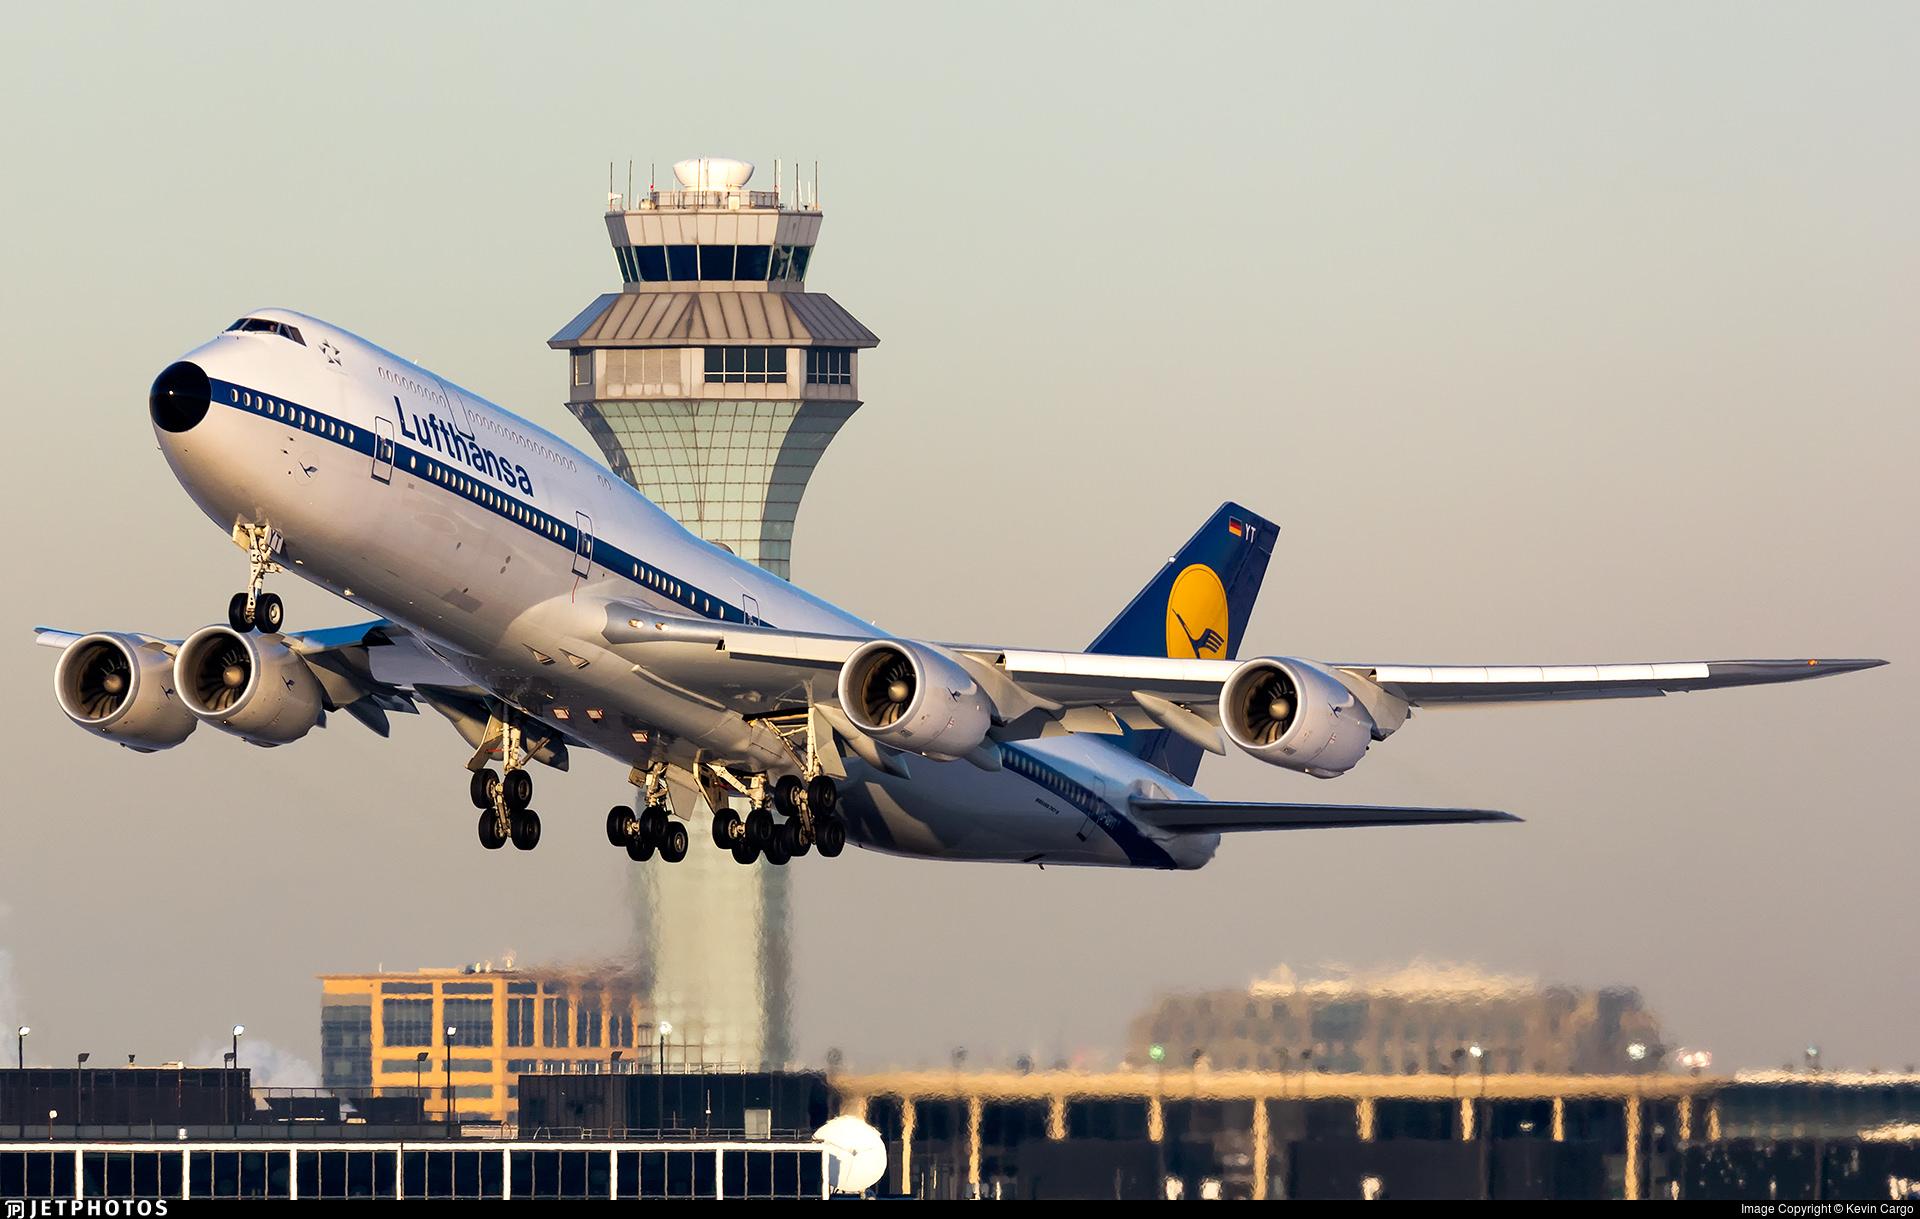 Lufthansa 747 in retro jet livery departing Chicago